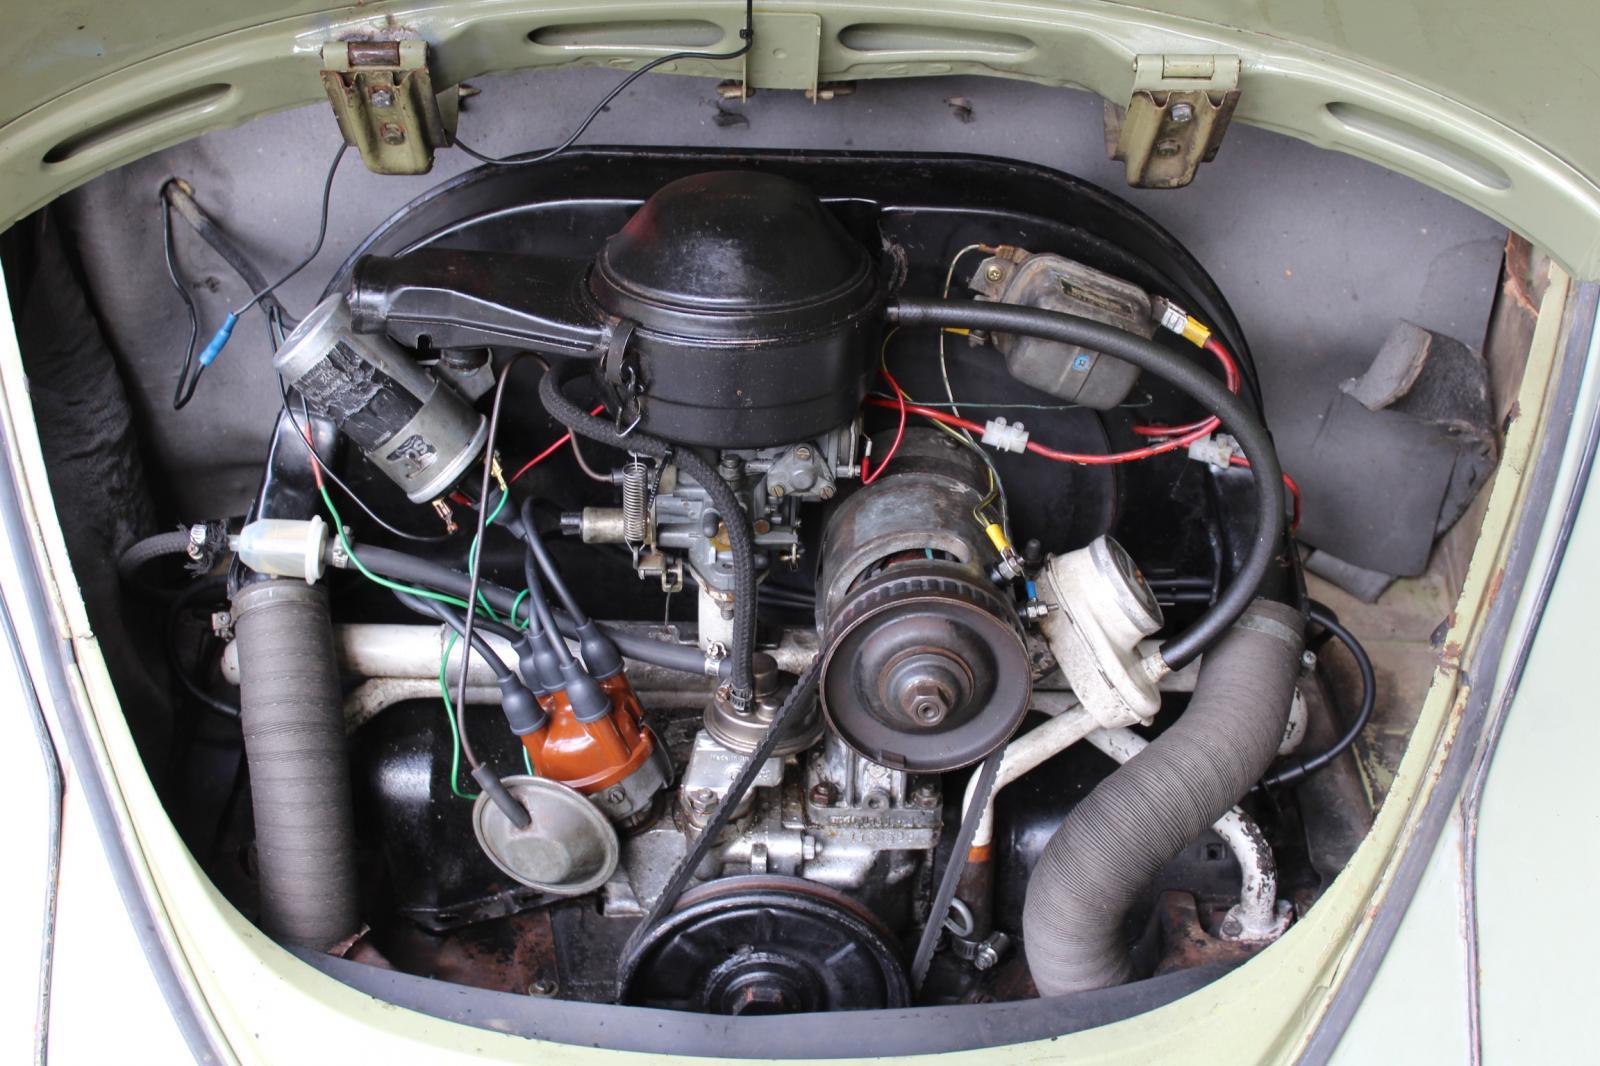 hight resolution of thesamba com beetle 1958 1967 view topic new engine build 1600cc volkswagen engine diagram http wwwthesambacom vw forum